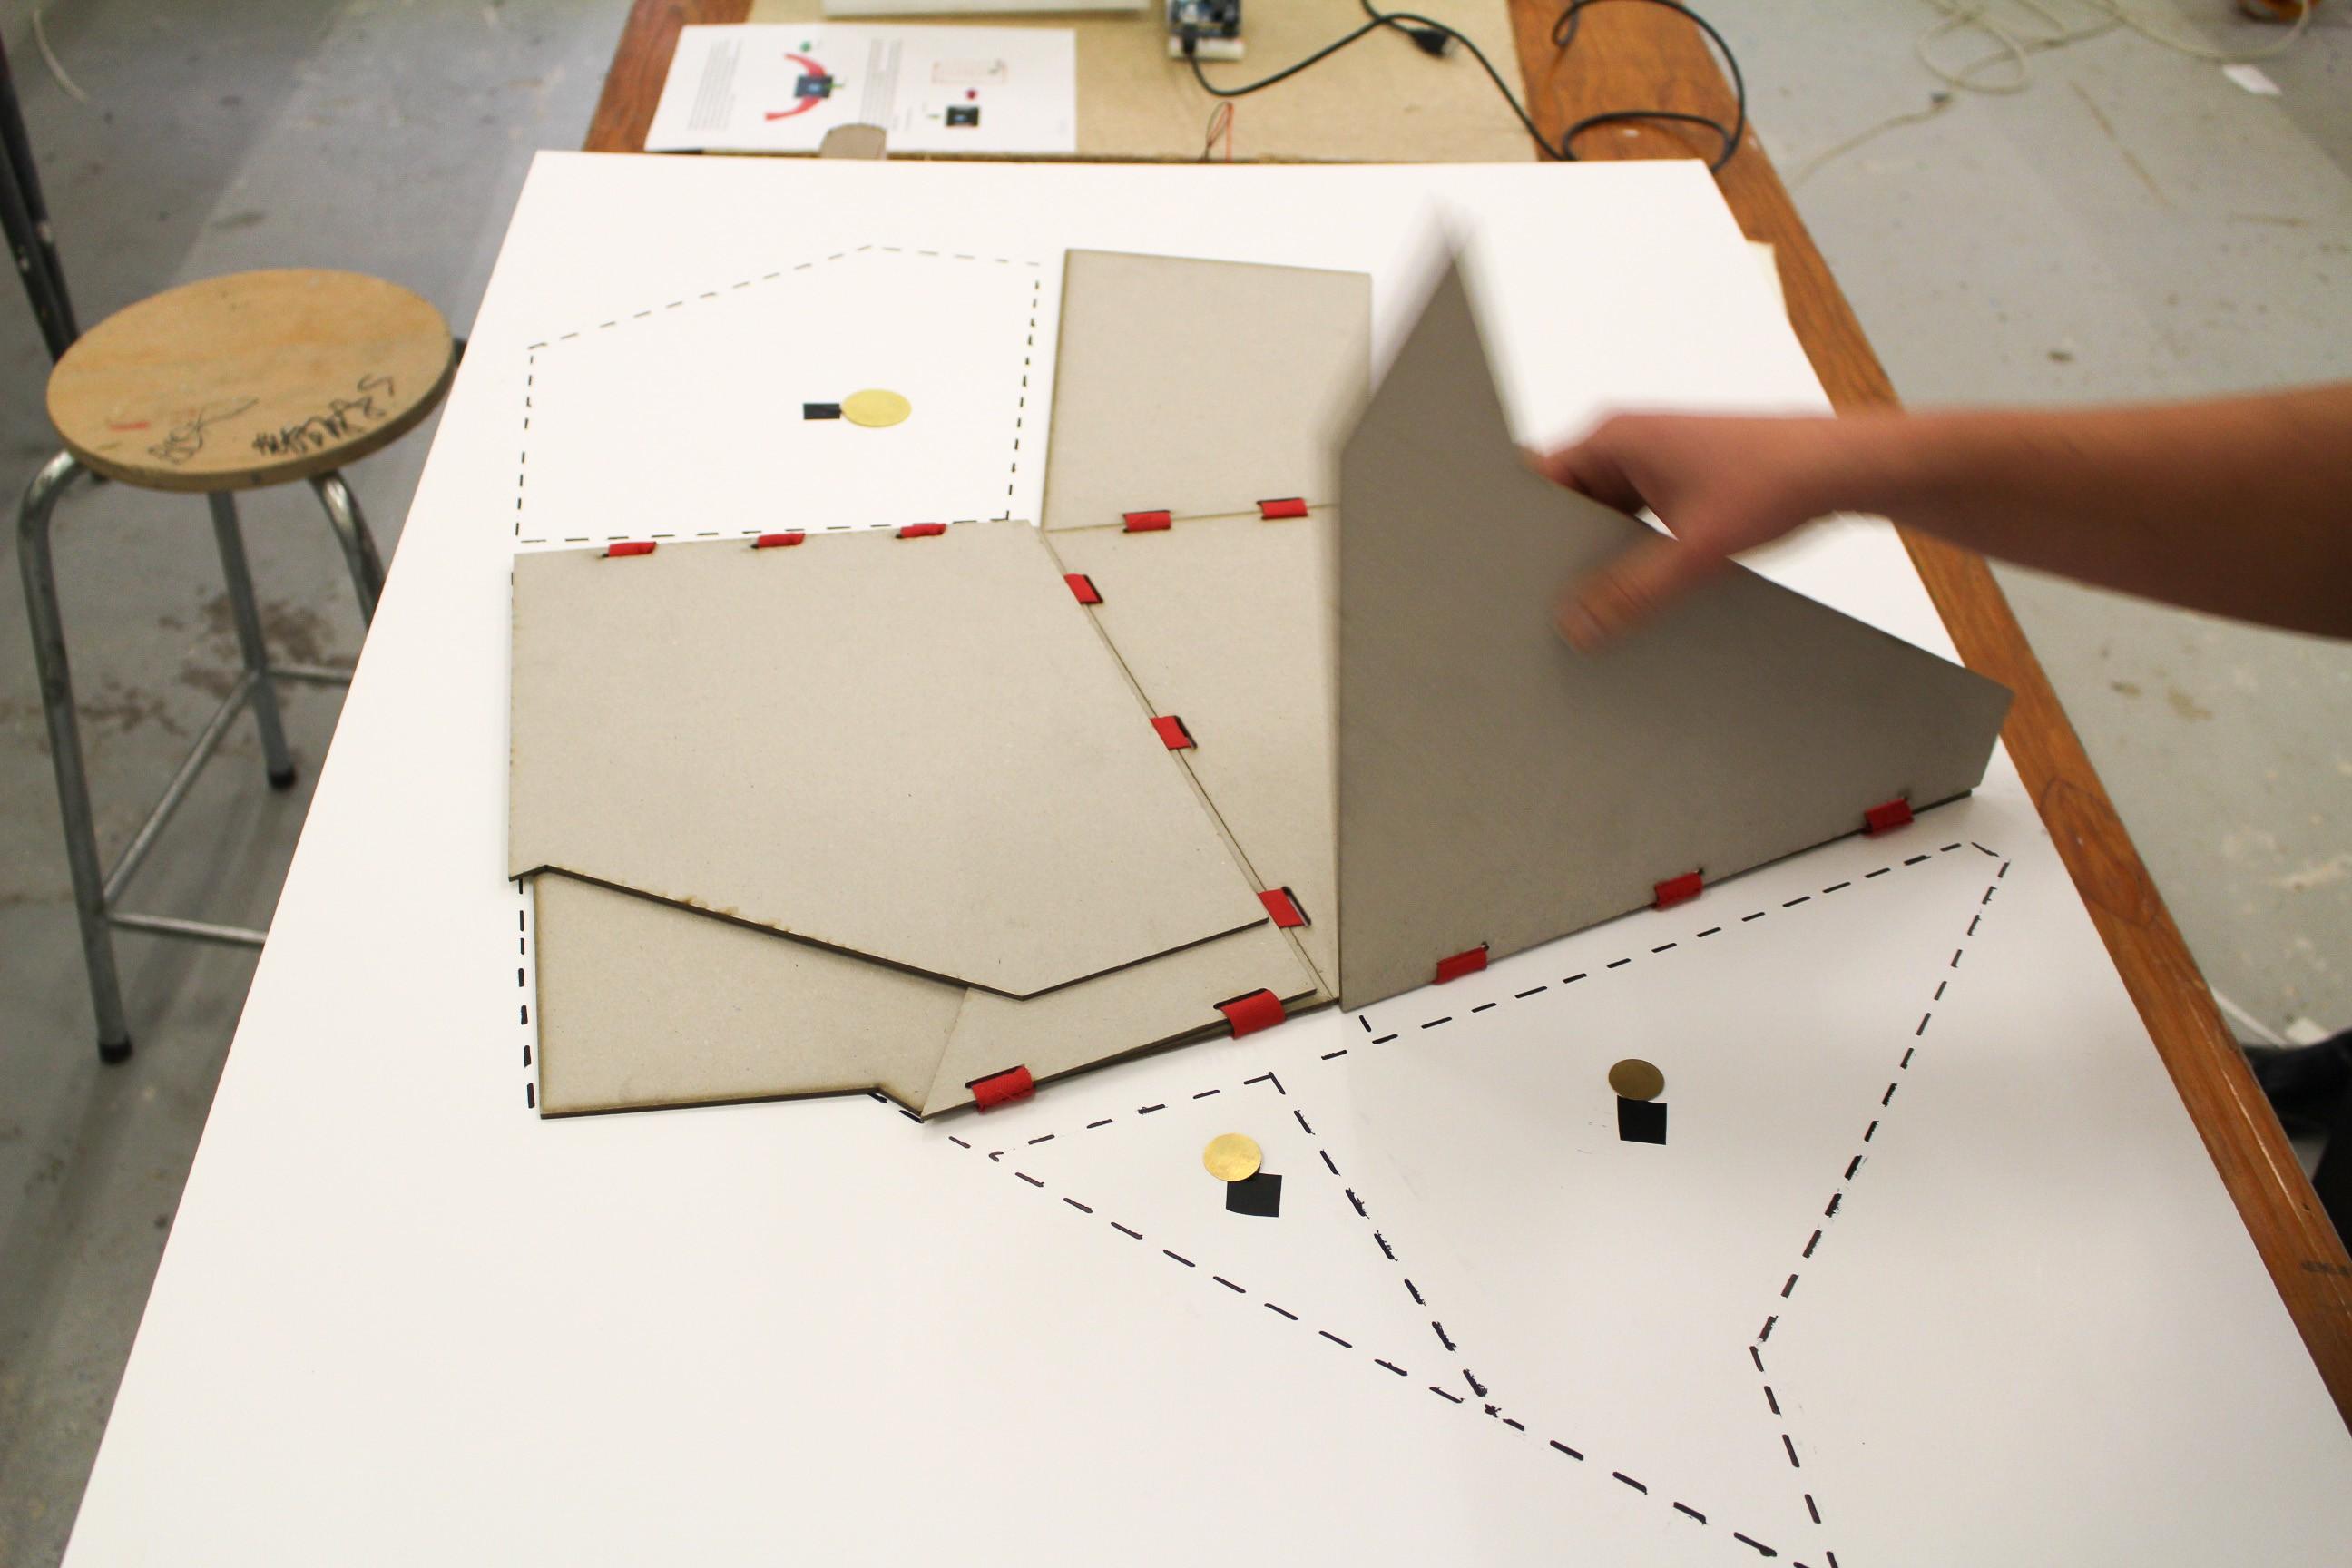 Interaktiv arkitektur - E14